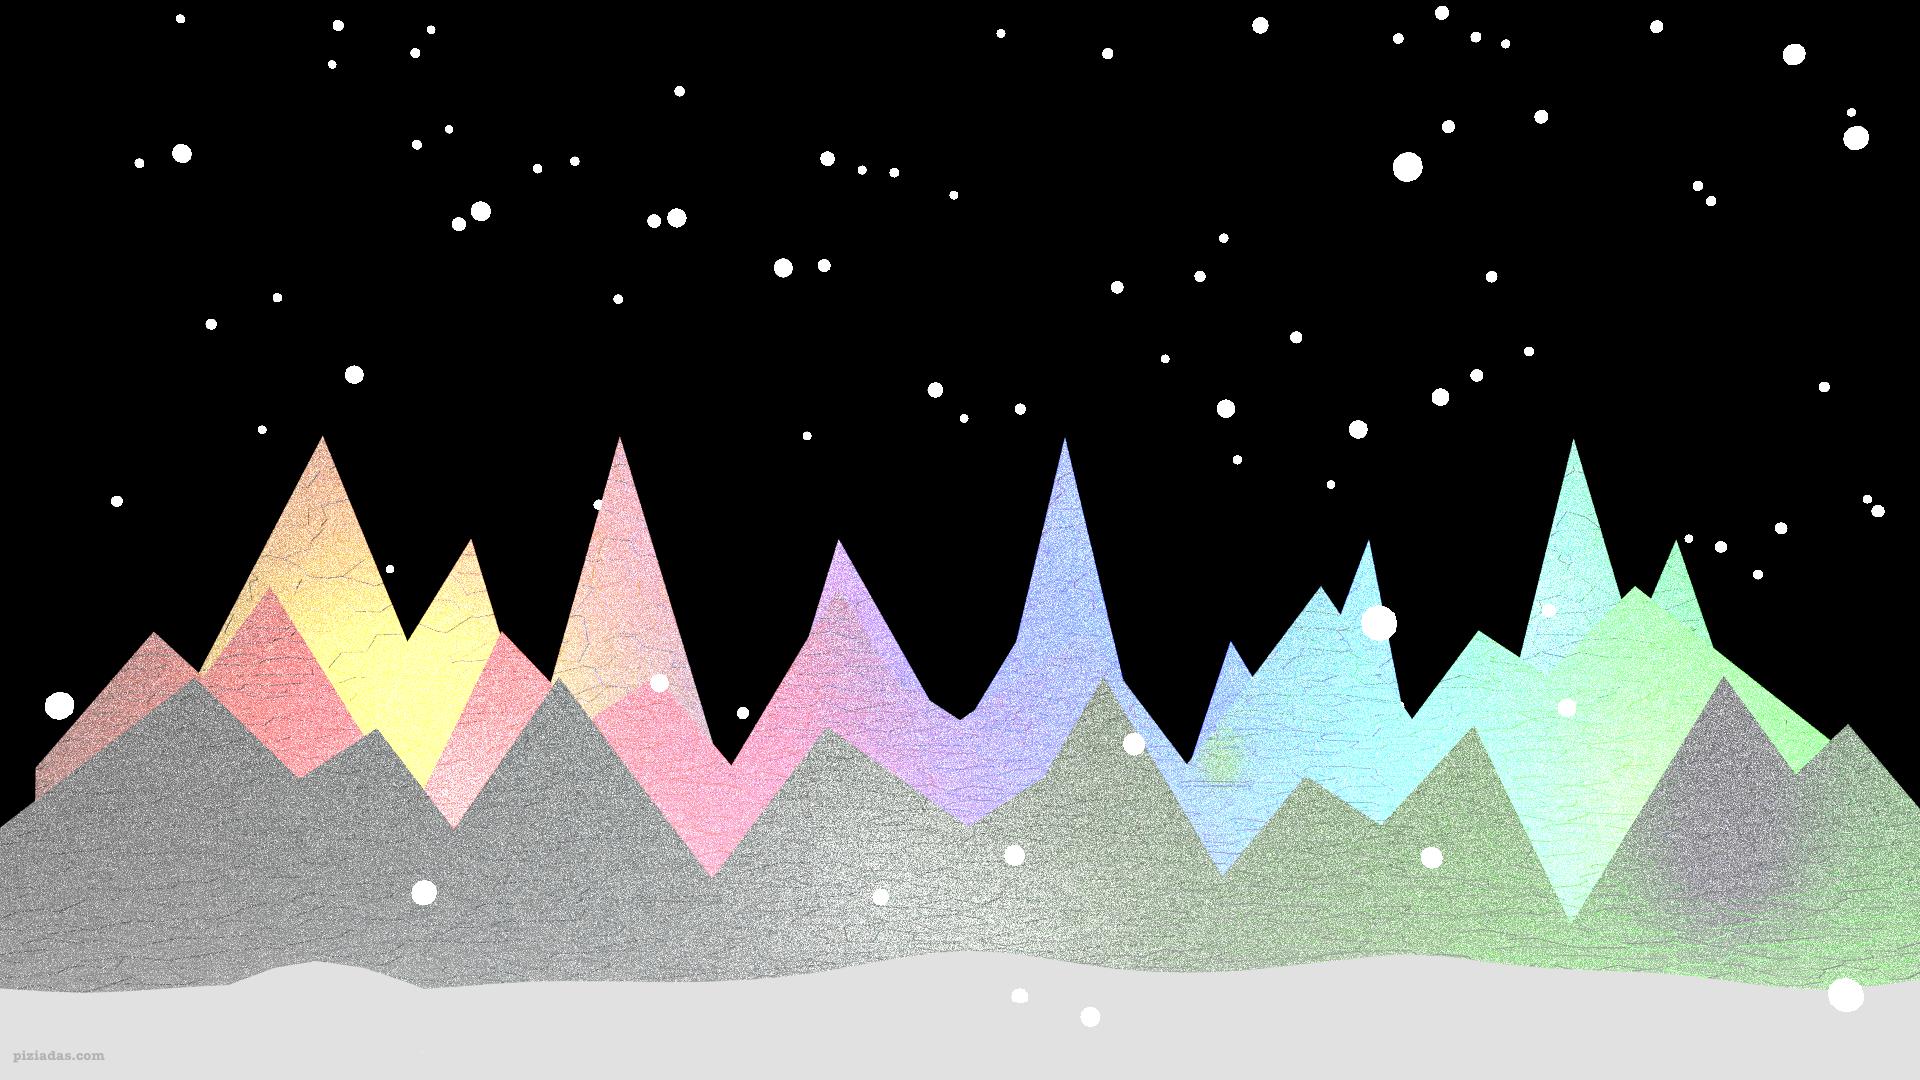 Tumblr Fondos De Pantalla Para Computadoras: Fondos De Navidad Tumblr - Wallpaper Hd 4